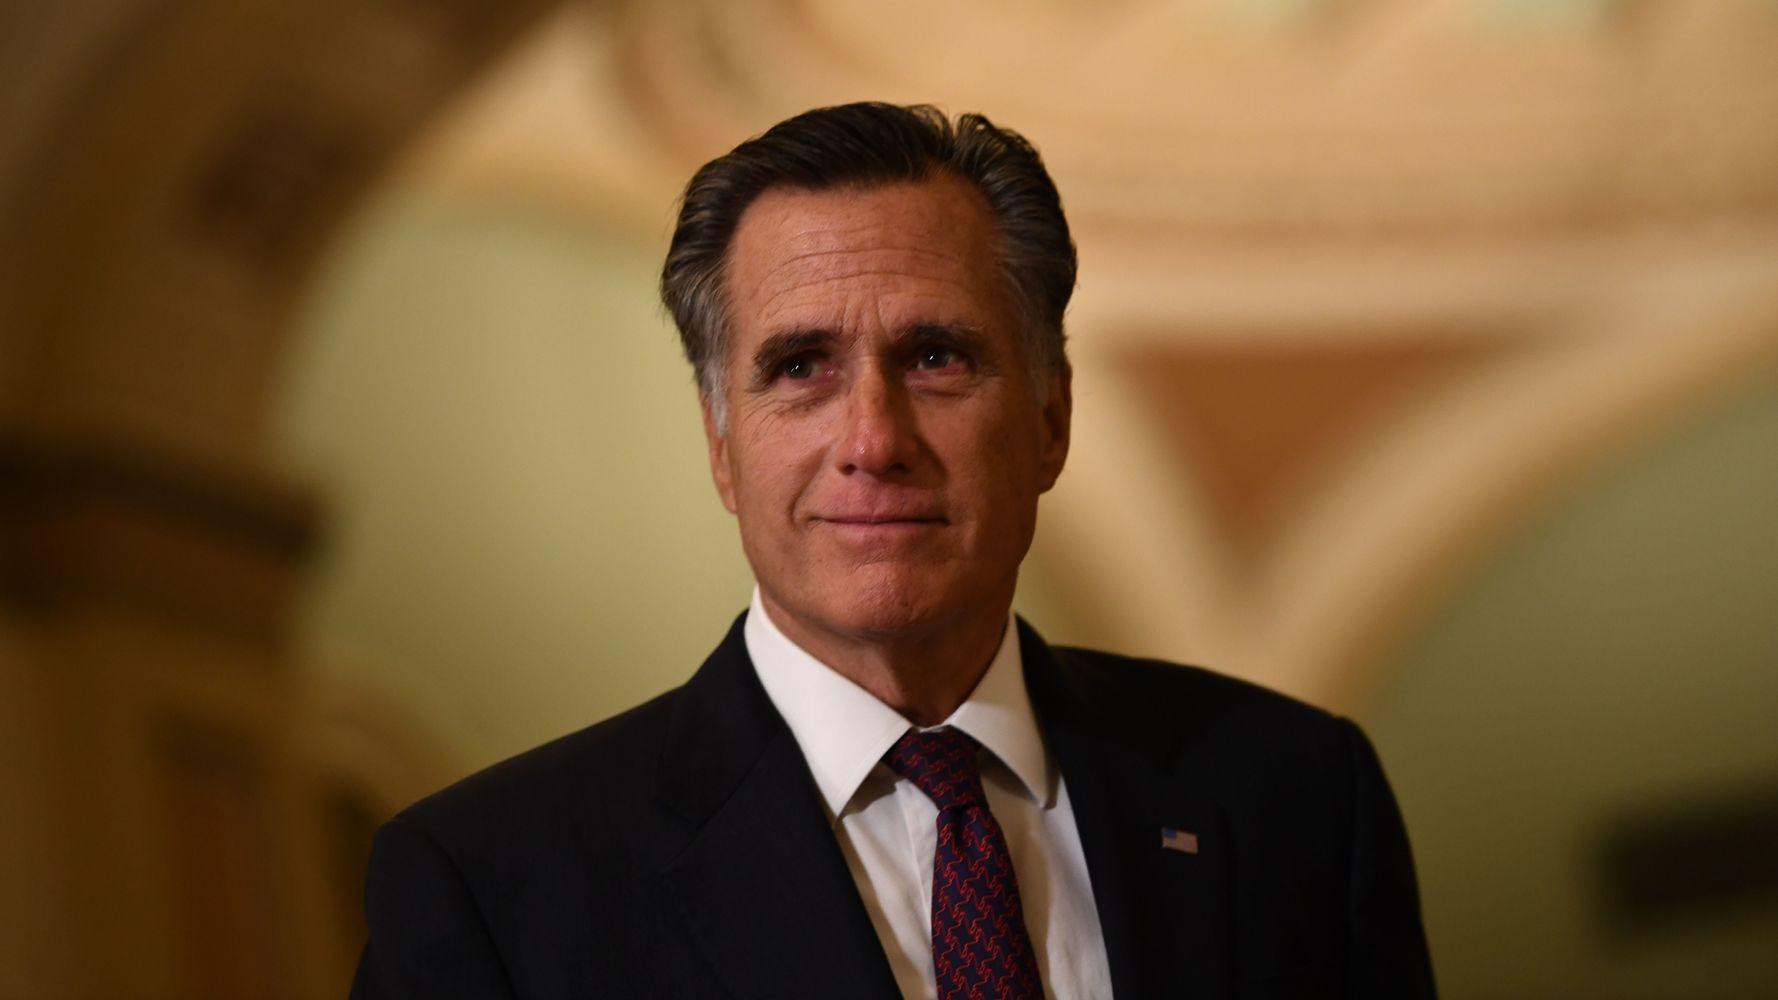 Mitt Romney Gets Standing Ovation At Democratic Presidential Debate